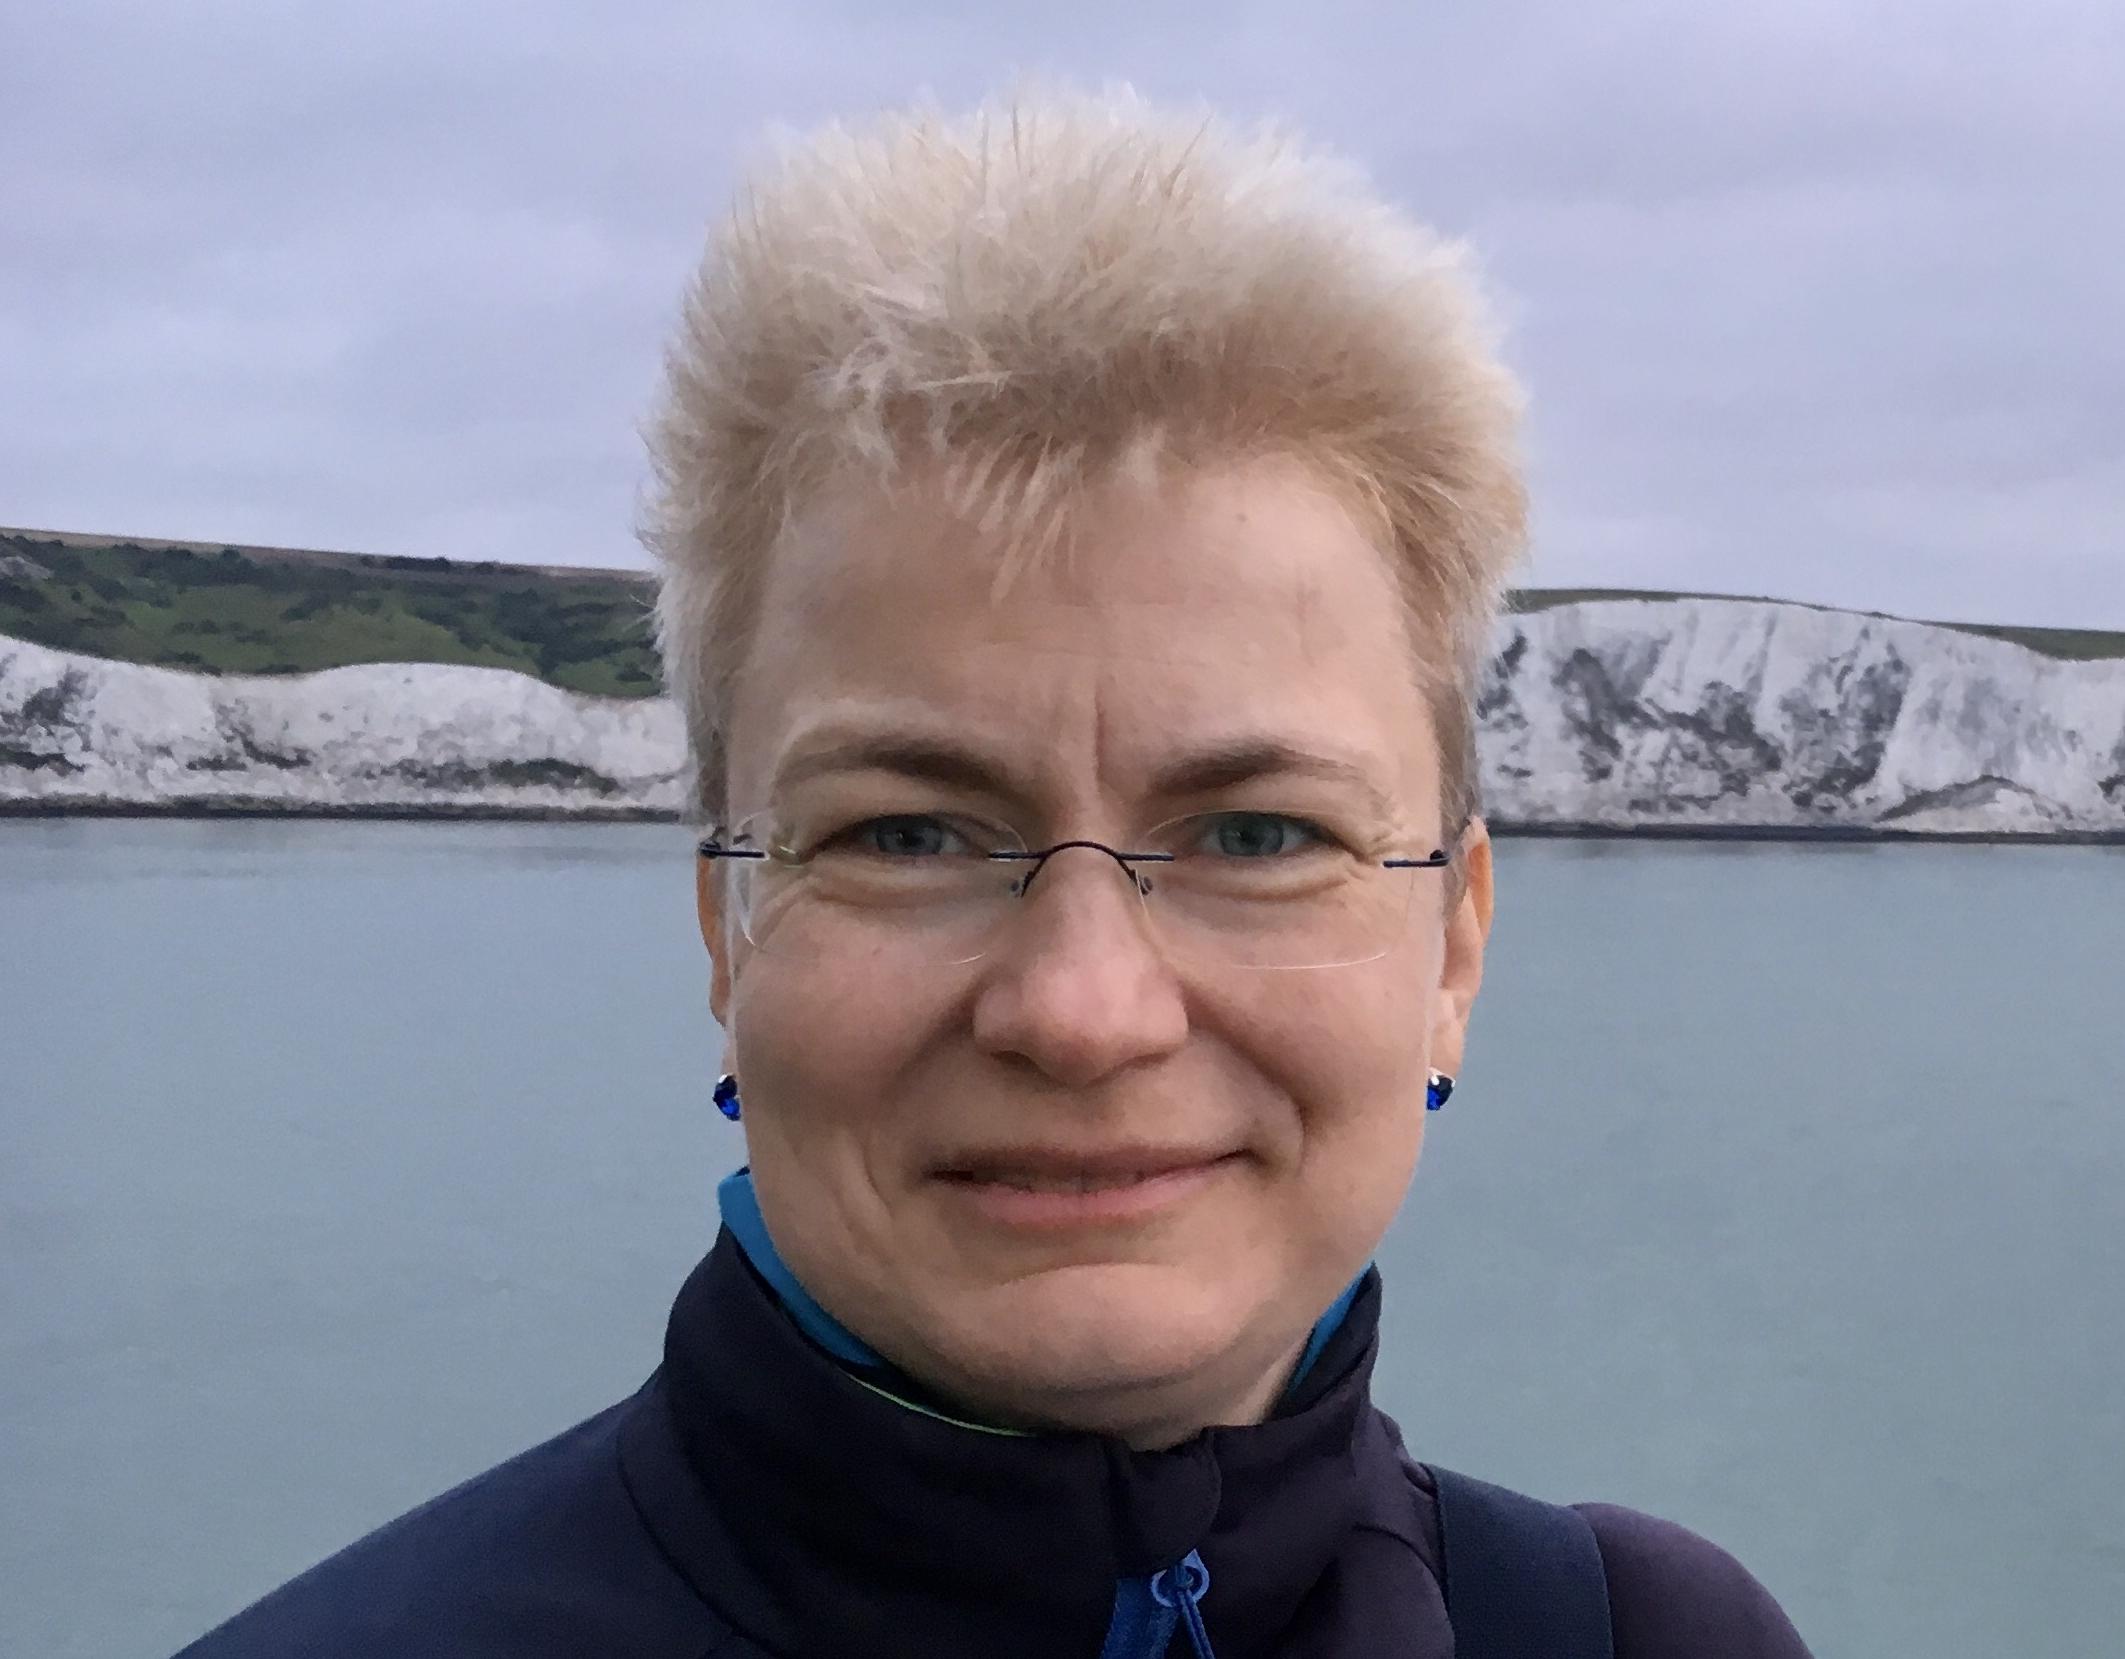 Astrid Maier